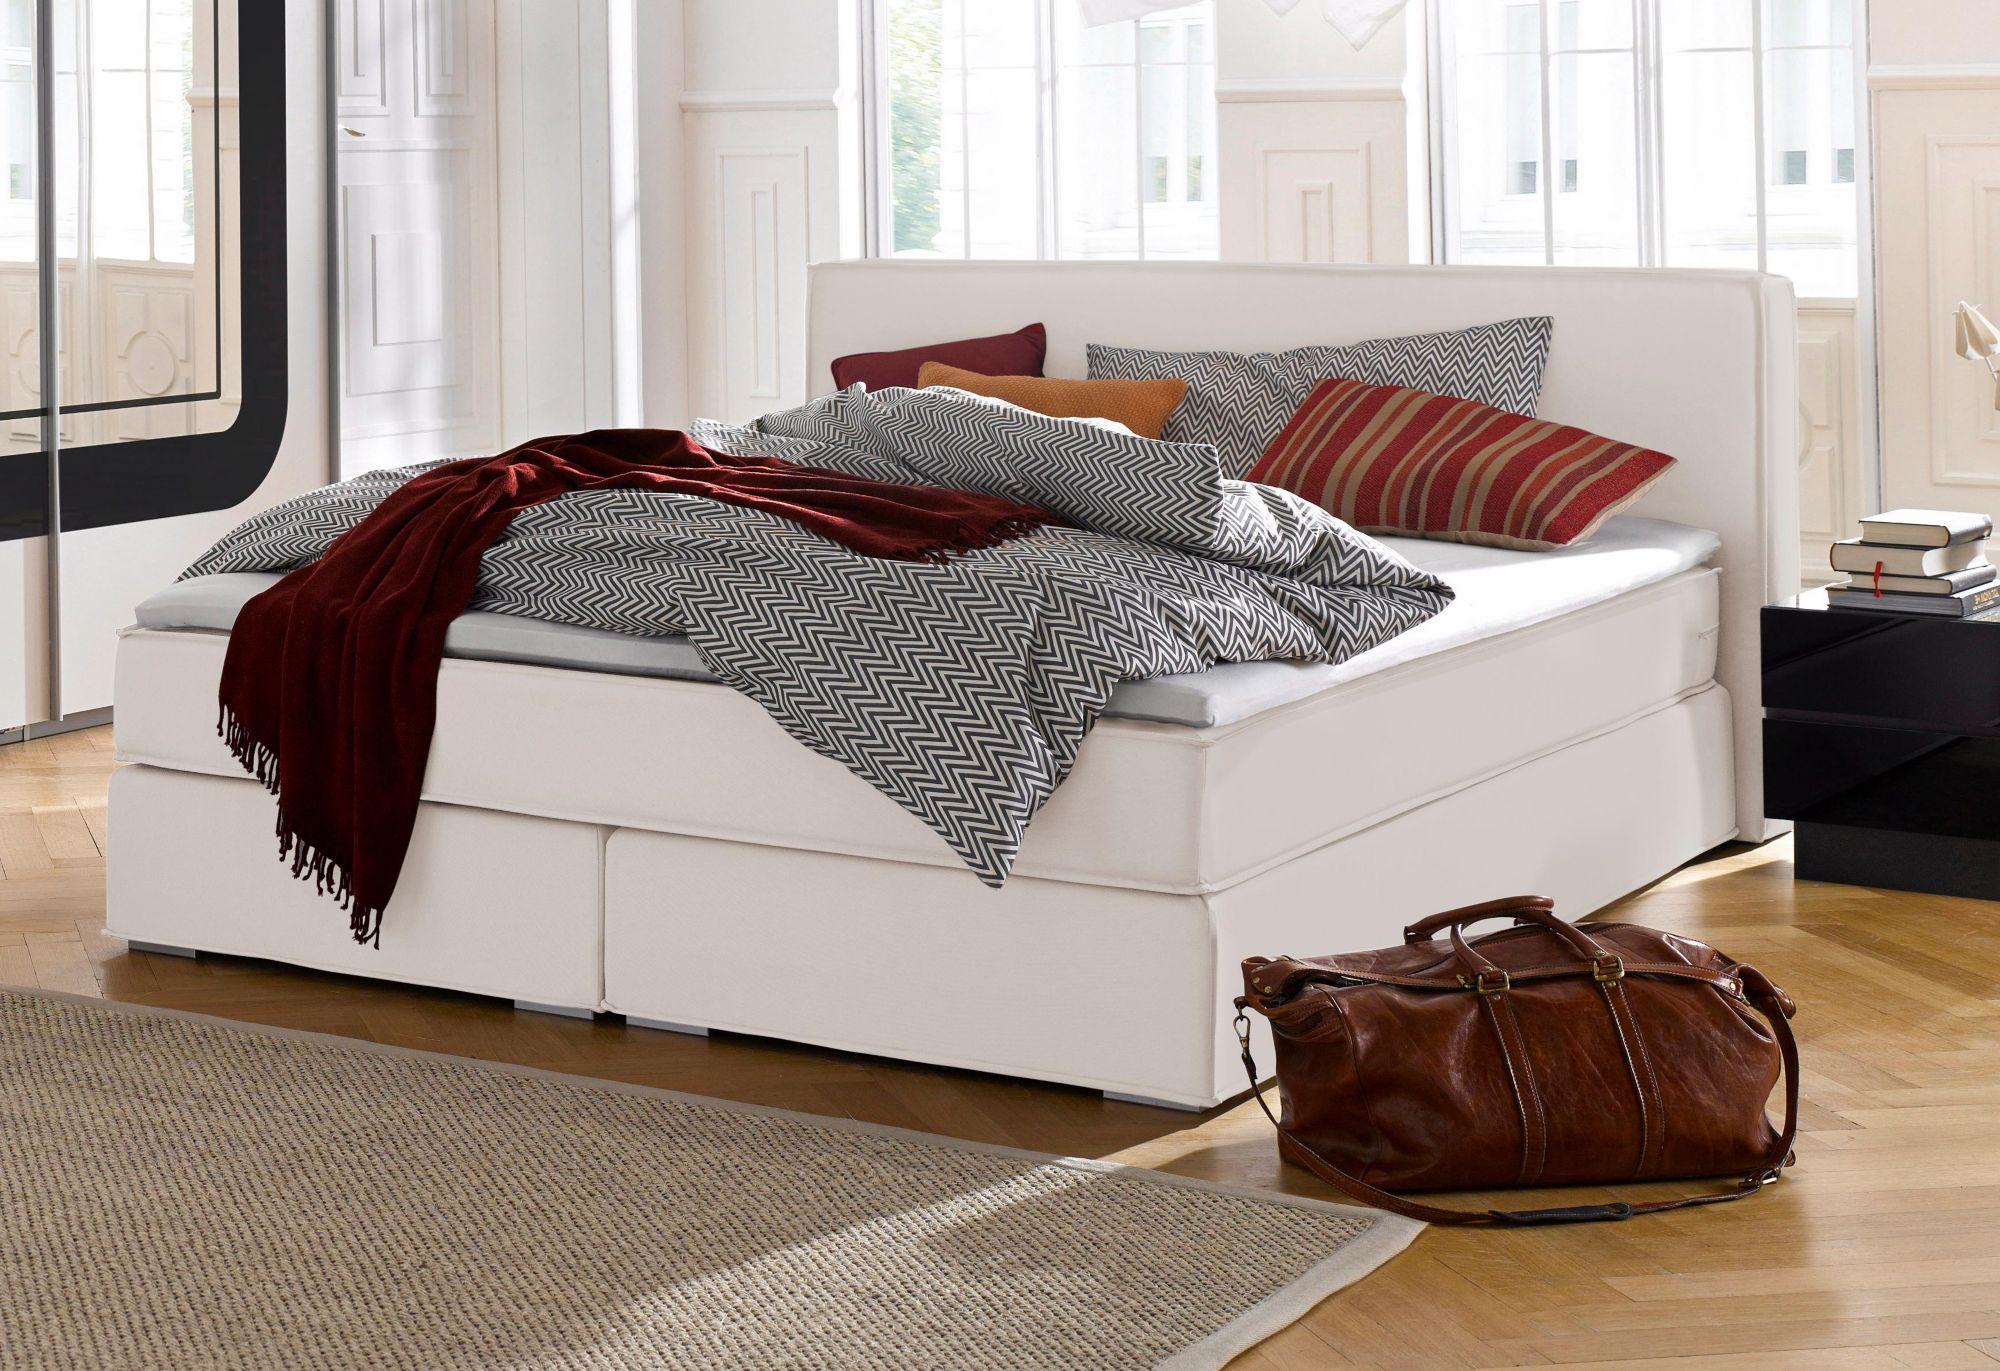 atlantic home collection boxspringbett schwab versand betten. Black Bedroom Furniture Sets. Home Design Ideas